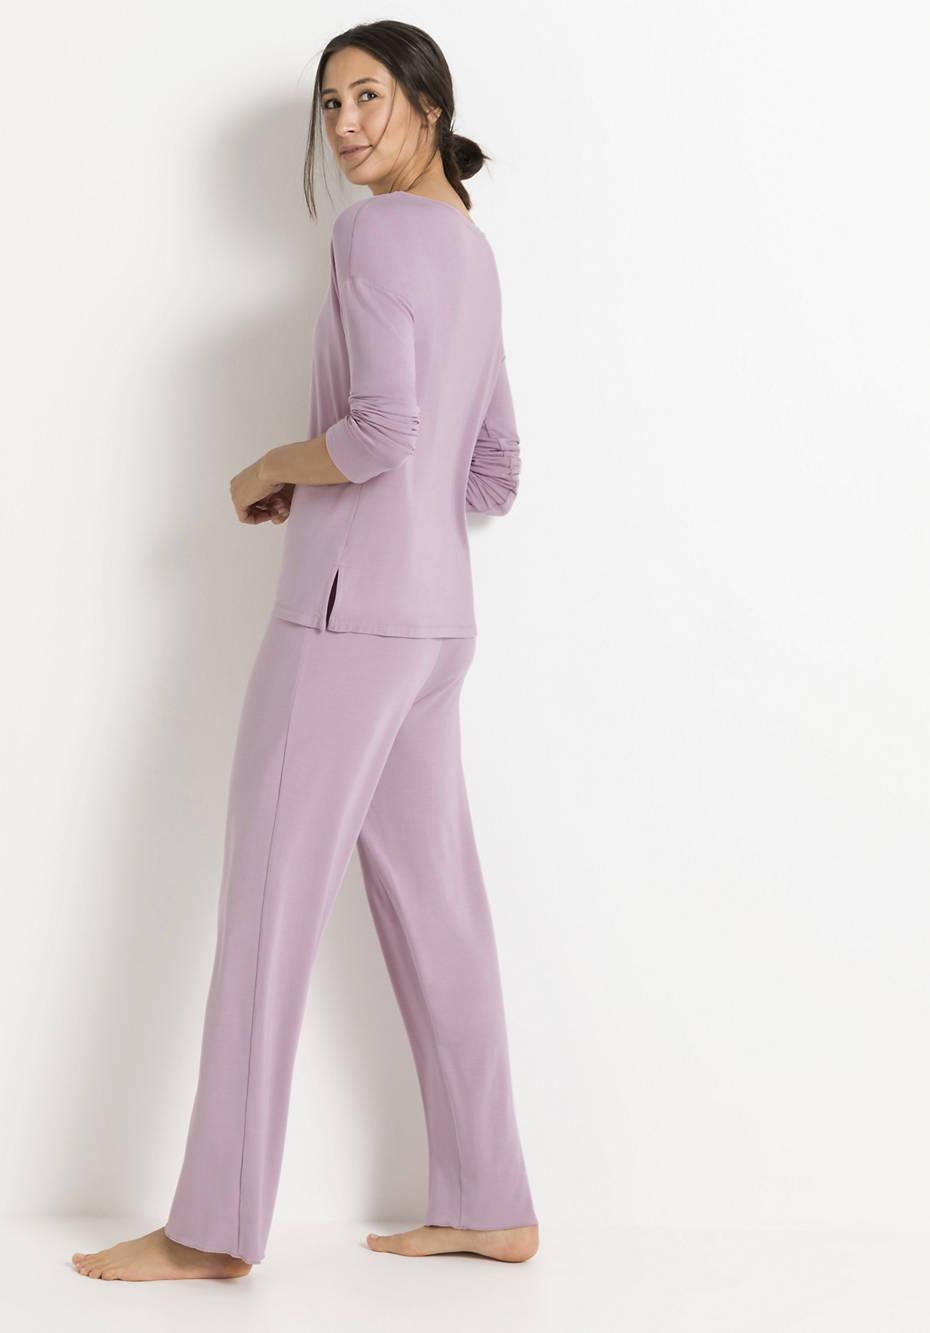 Sleep trousers made from TENCEL ™ Modal